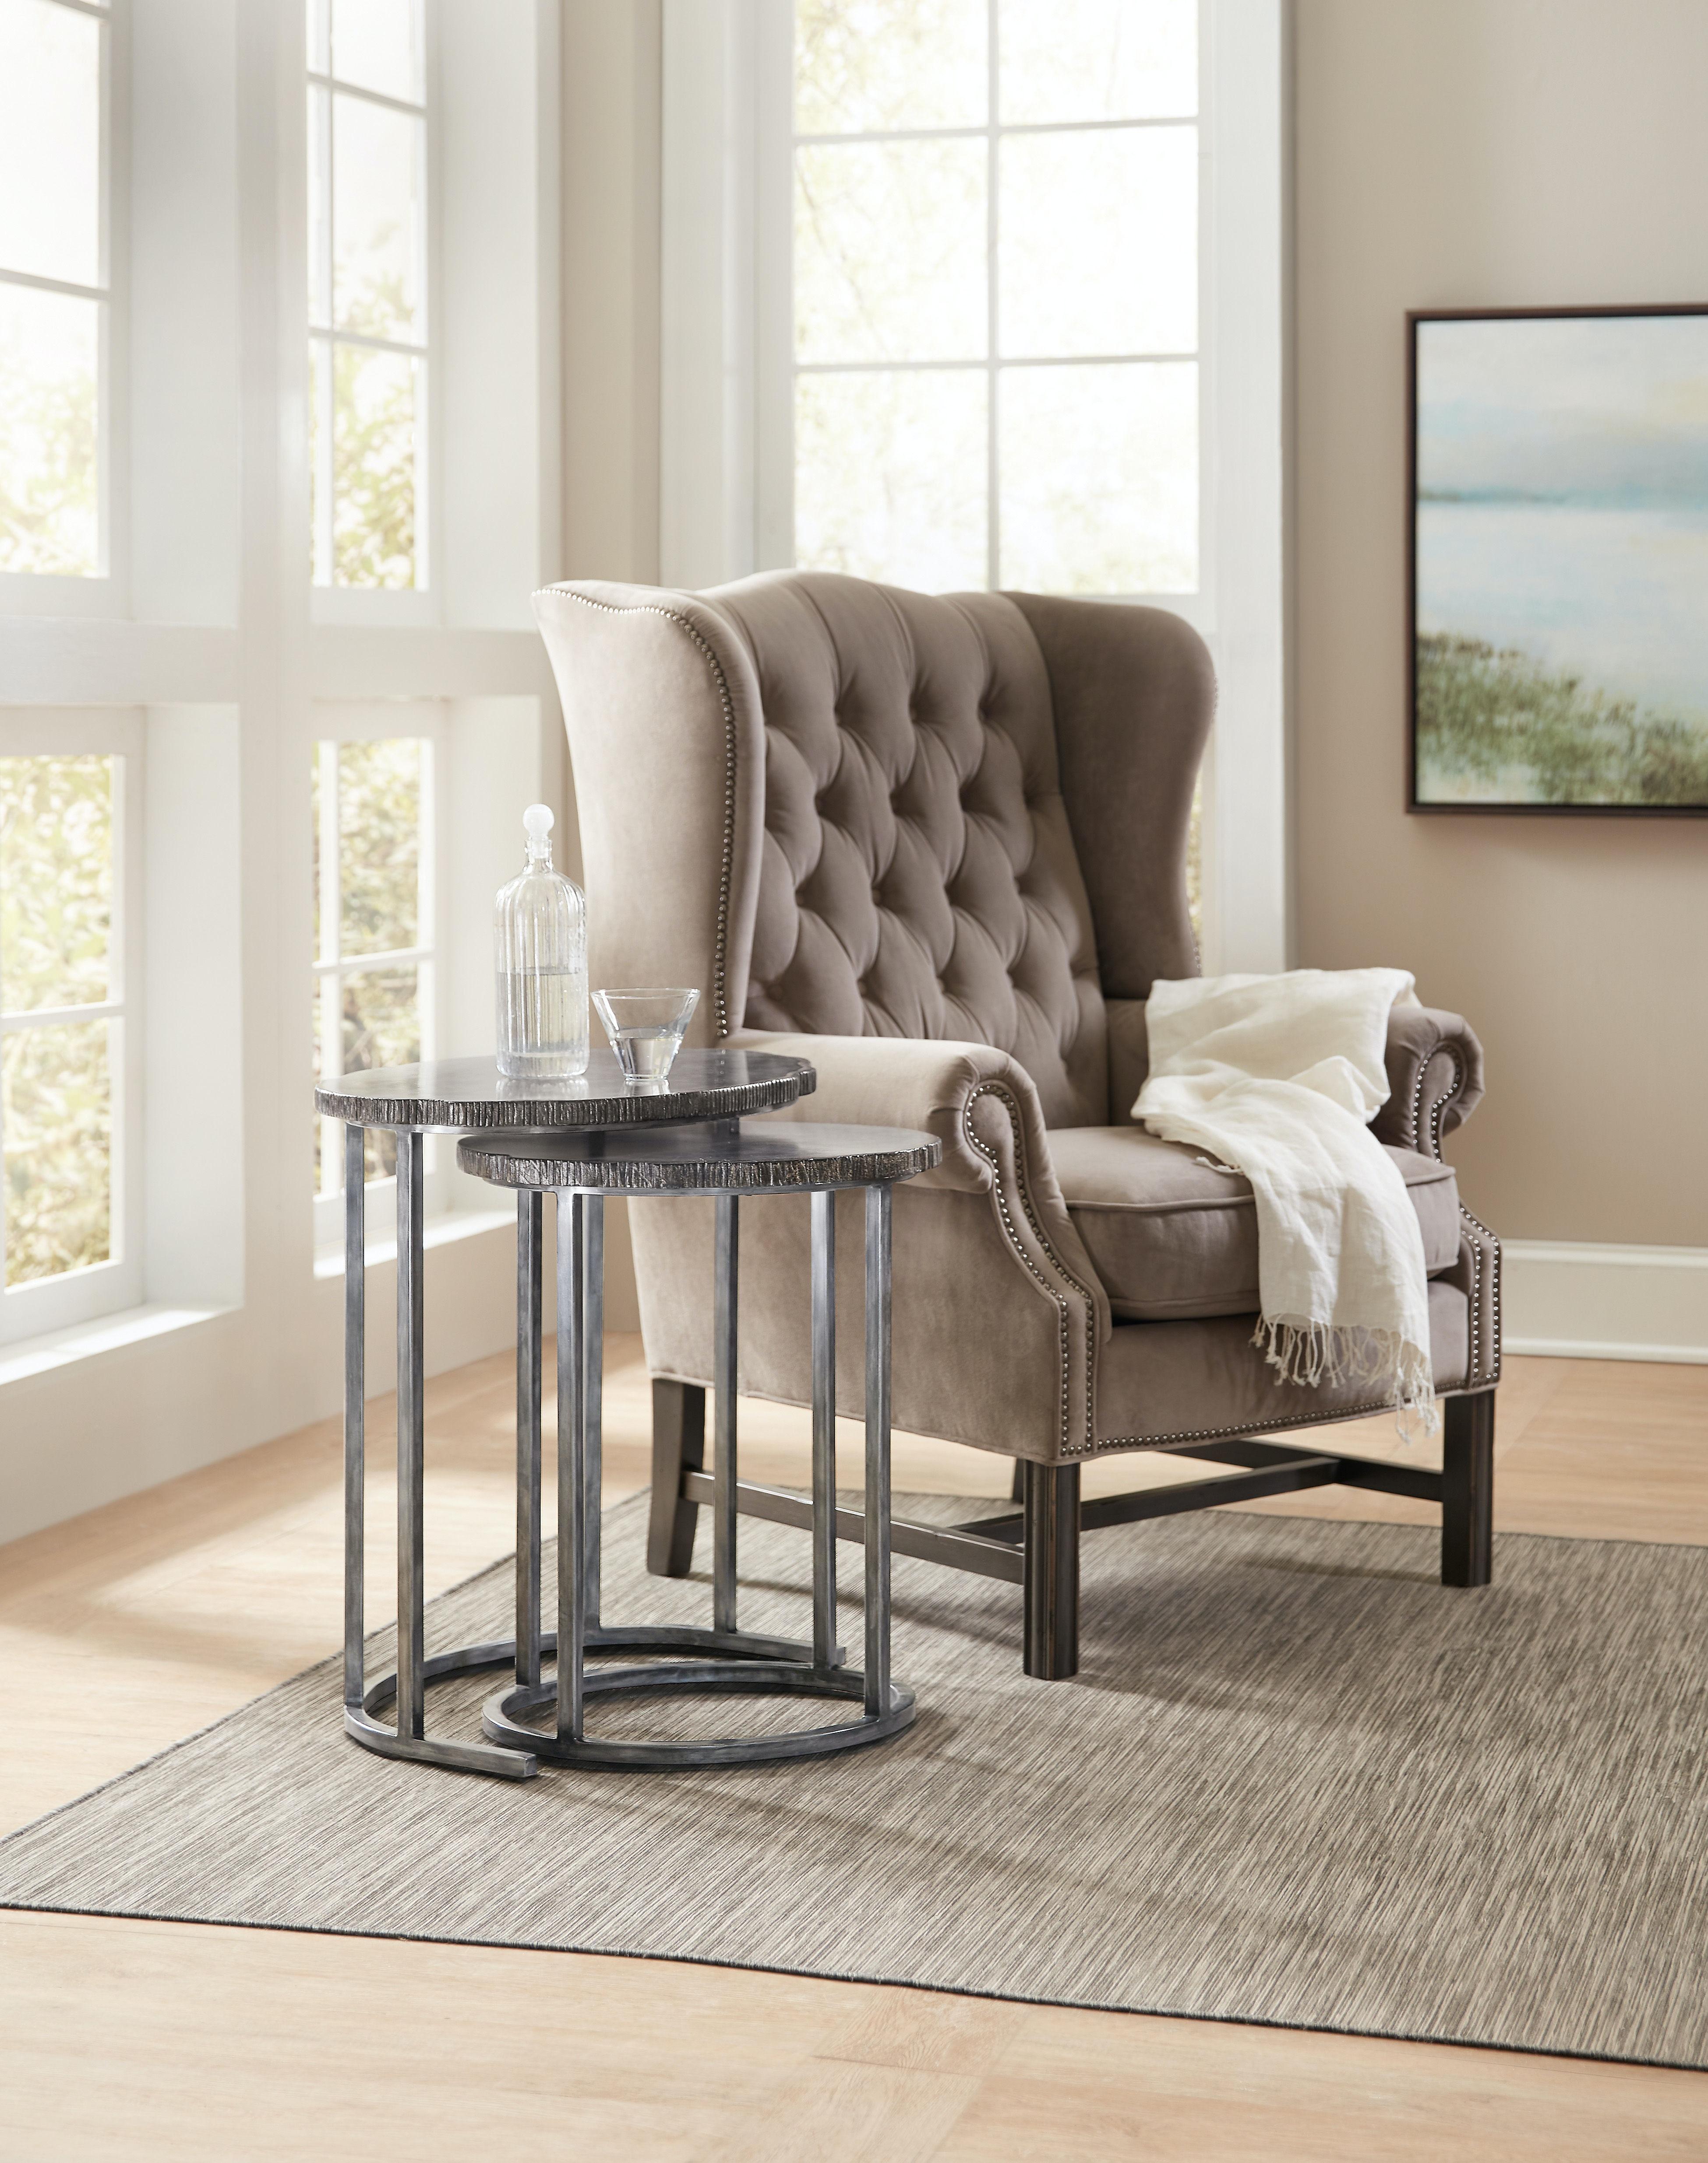 Hooker Furniture Nesting Tables 500 50 949 DKW Living